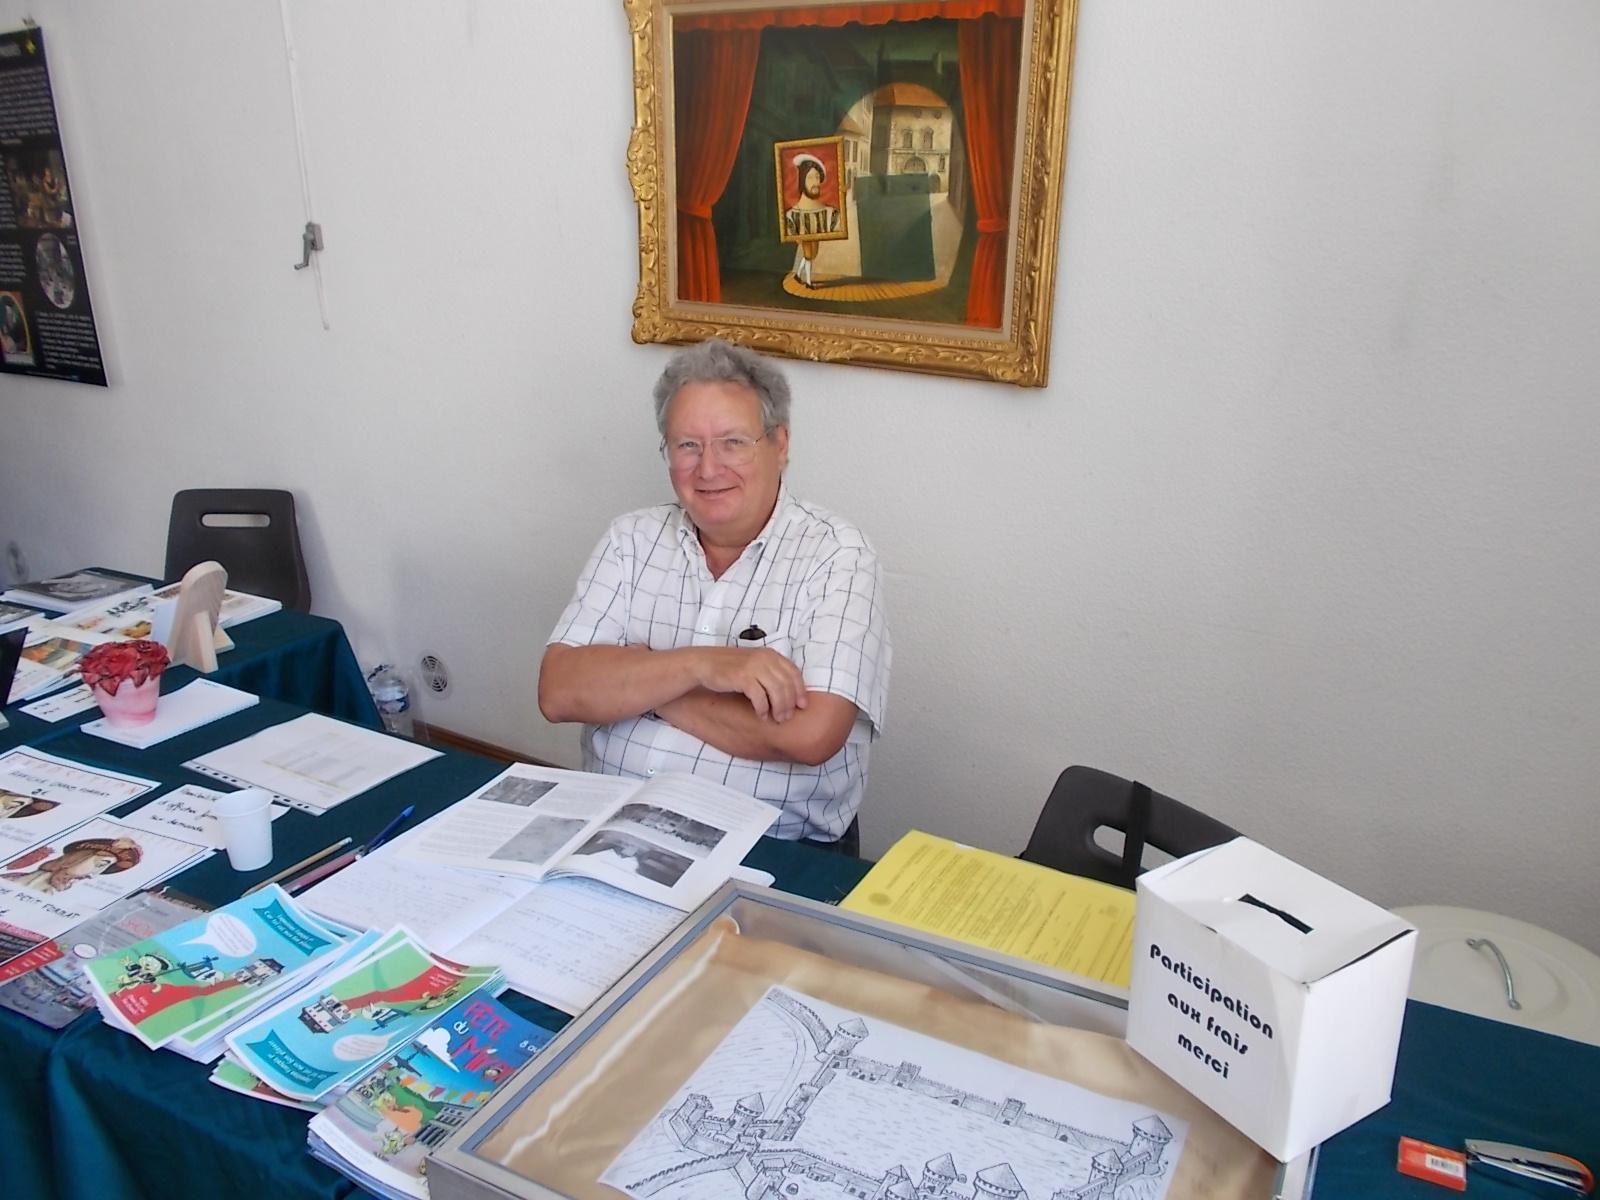 Jean-Louis Duvillard